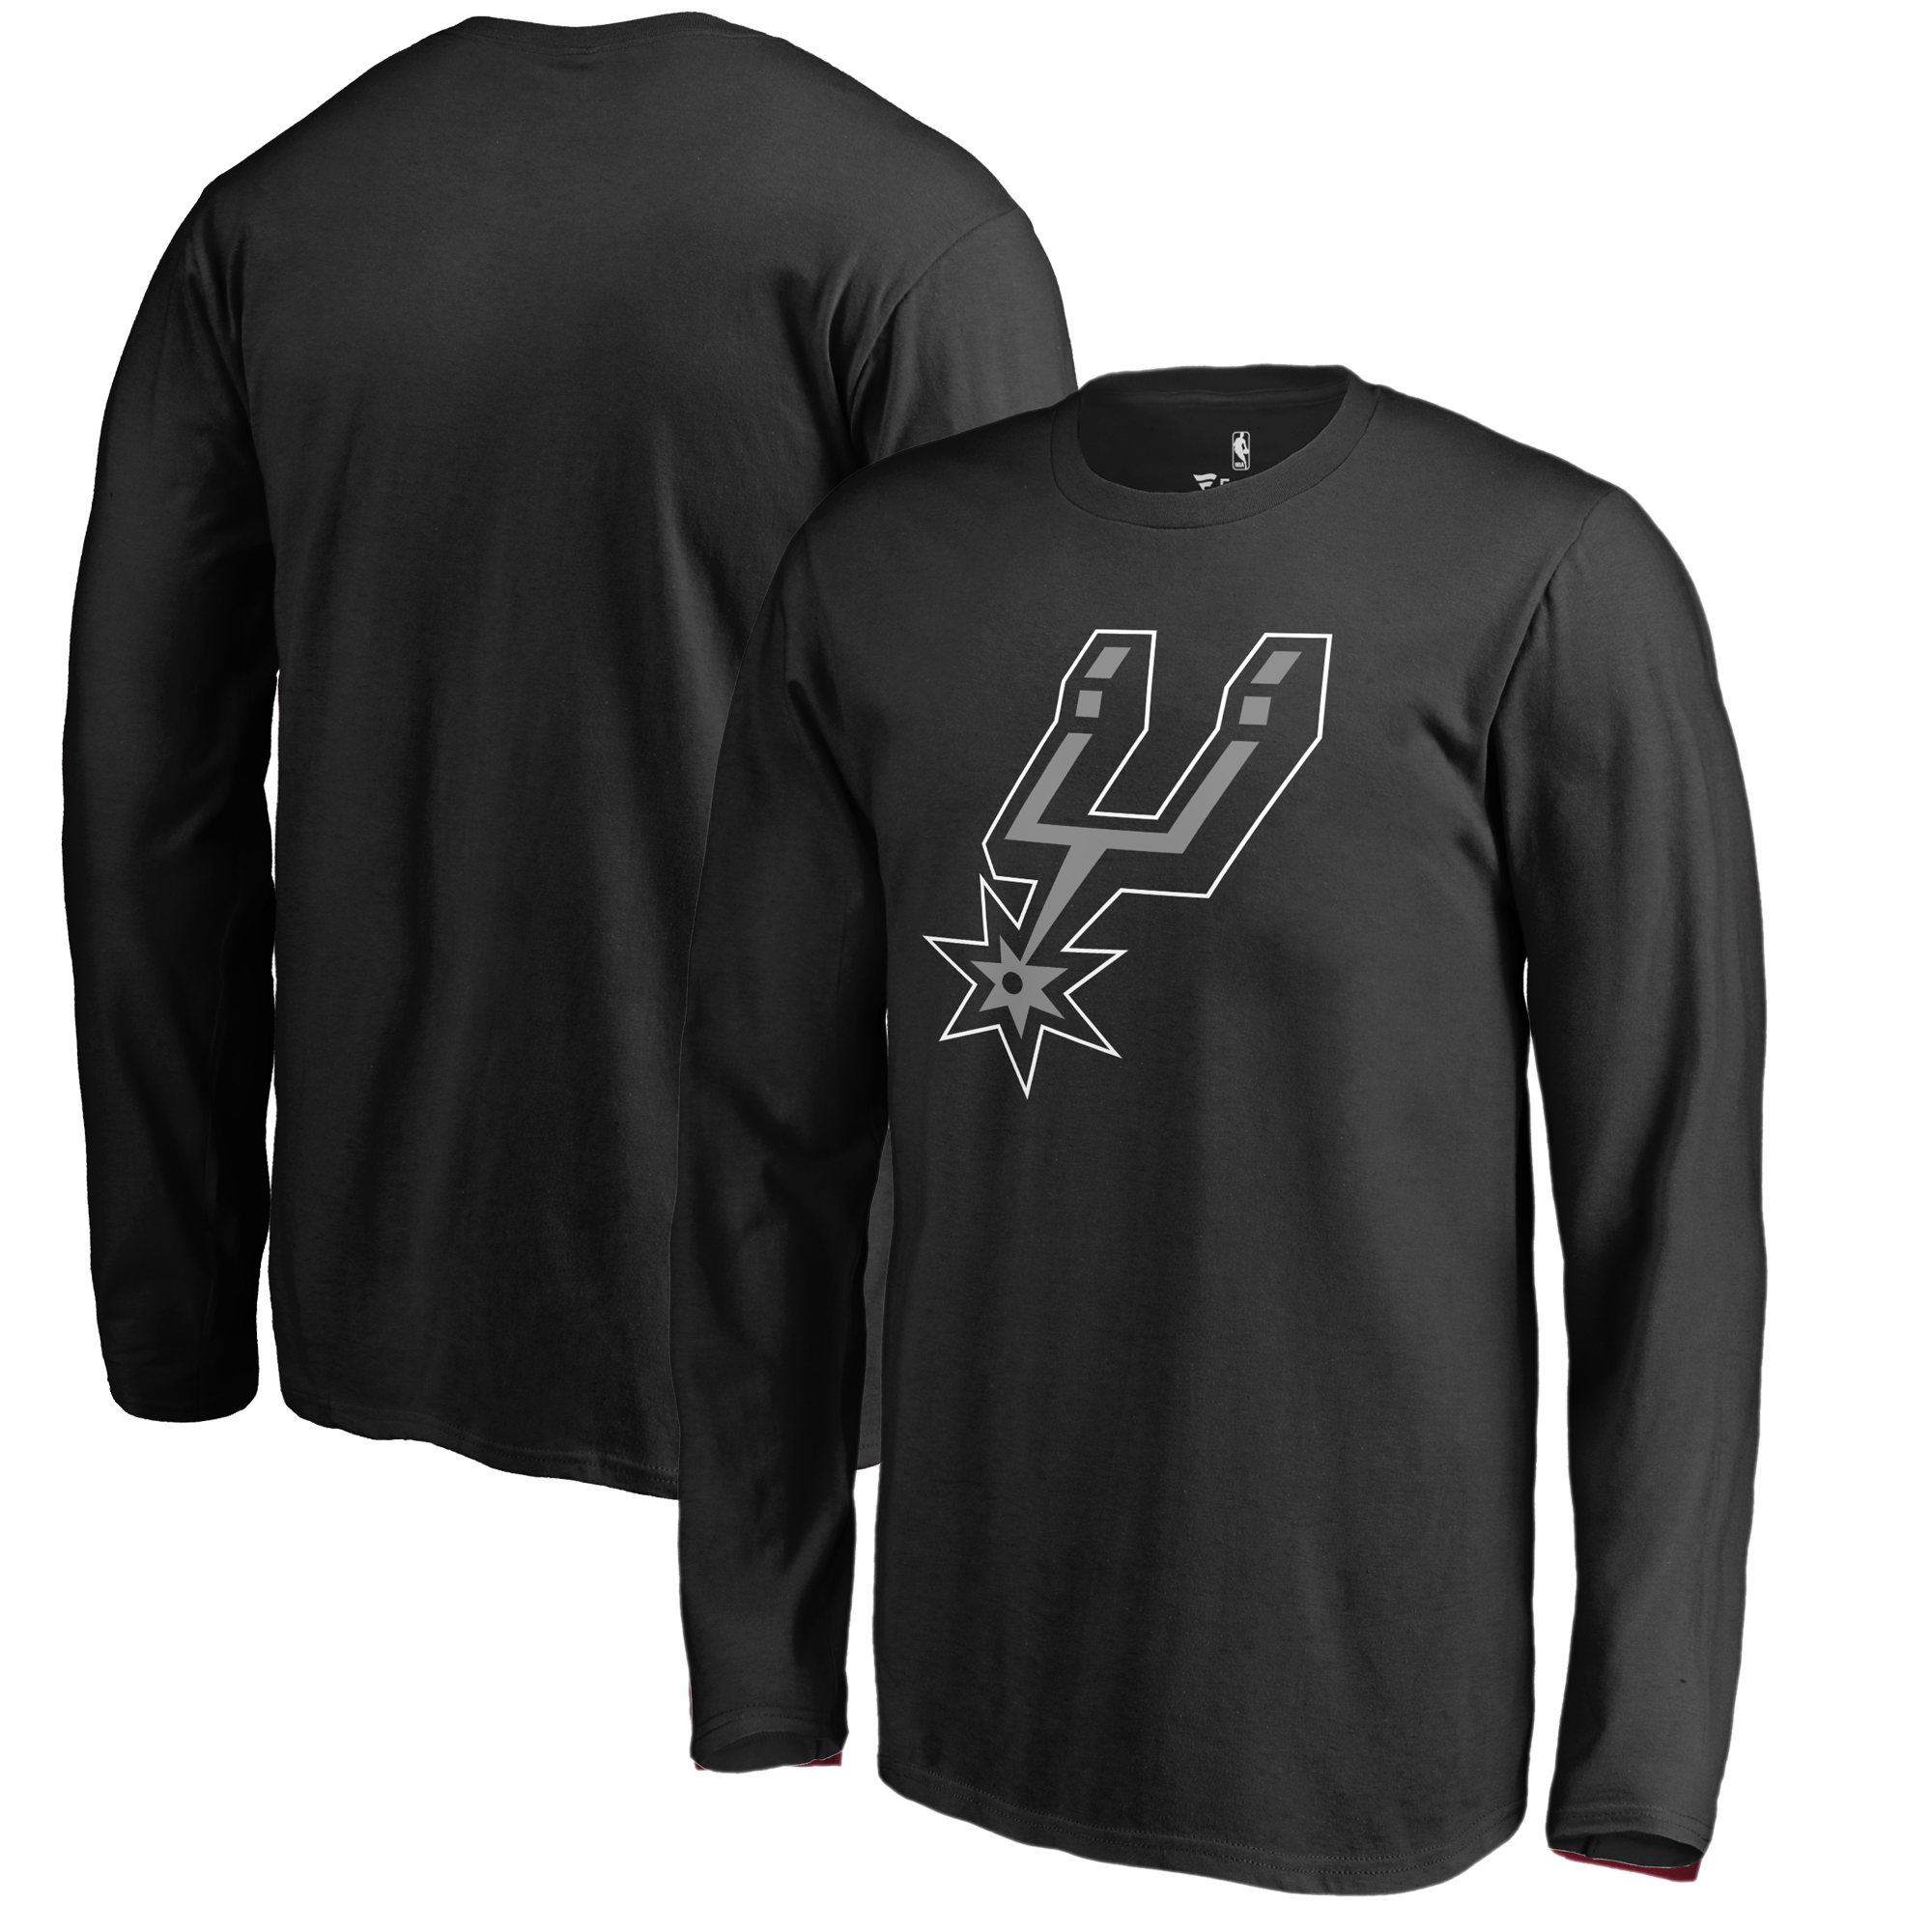 San Antonio Spurs Fanatics Branded Youth Primary Logo Long Sleeve T-Shirt - Black